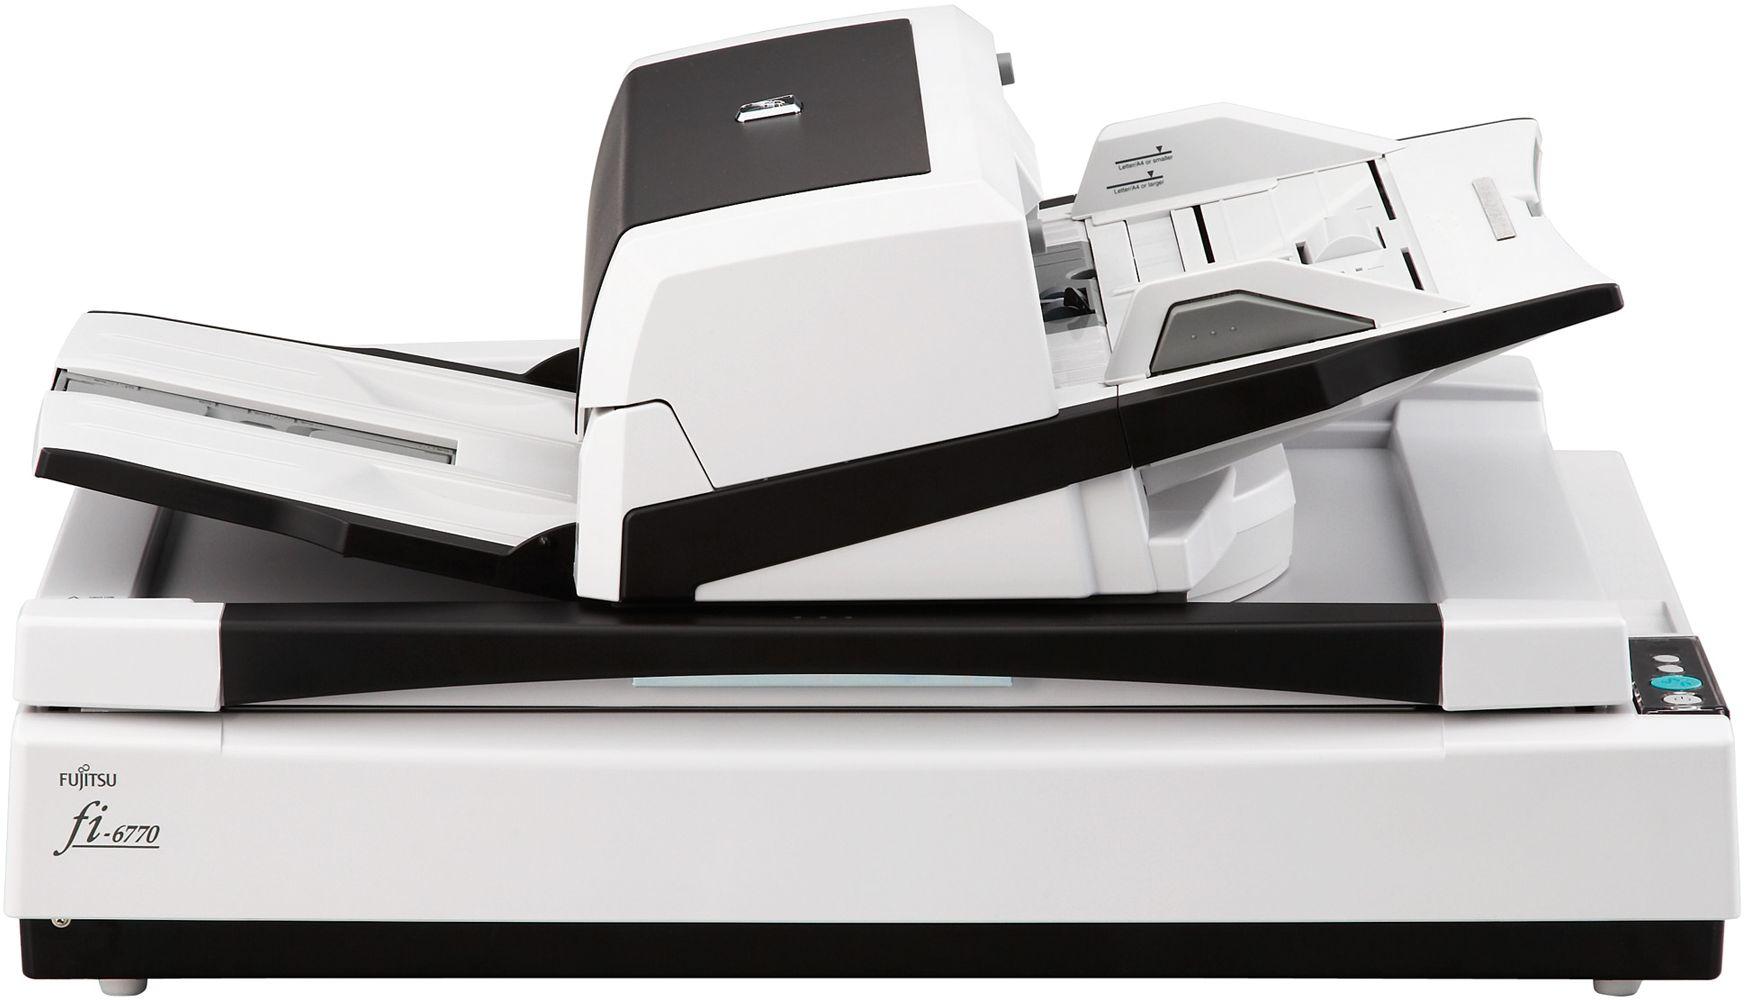 fujitsu fi 6770 document scanner With fujitsu document scanner fi 6770